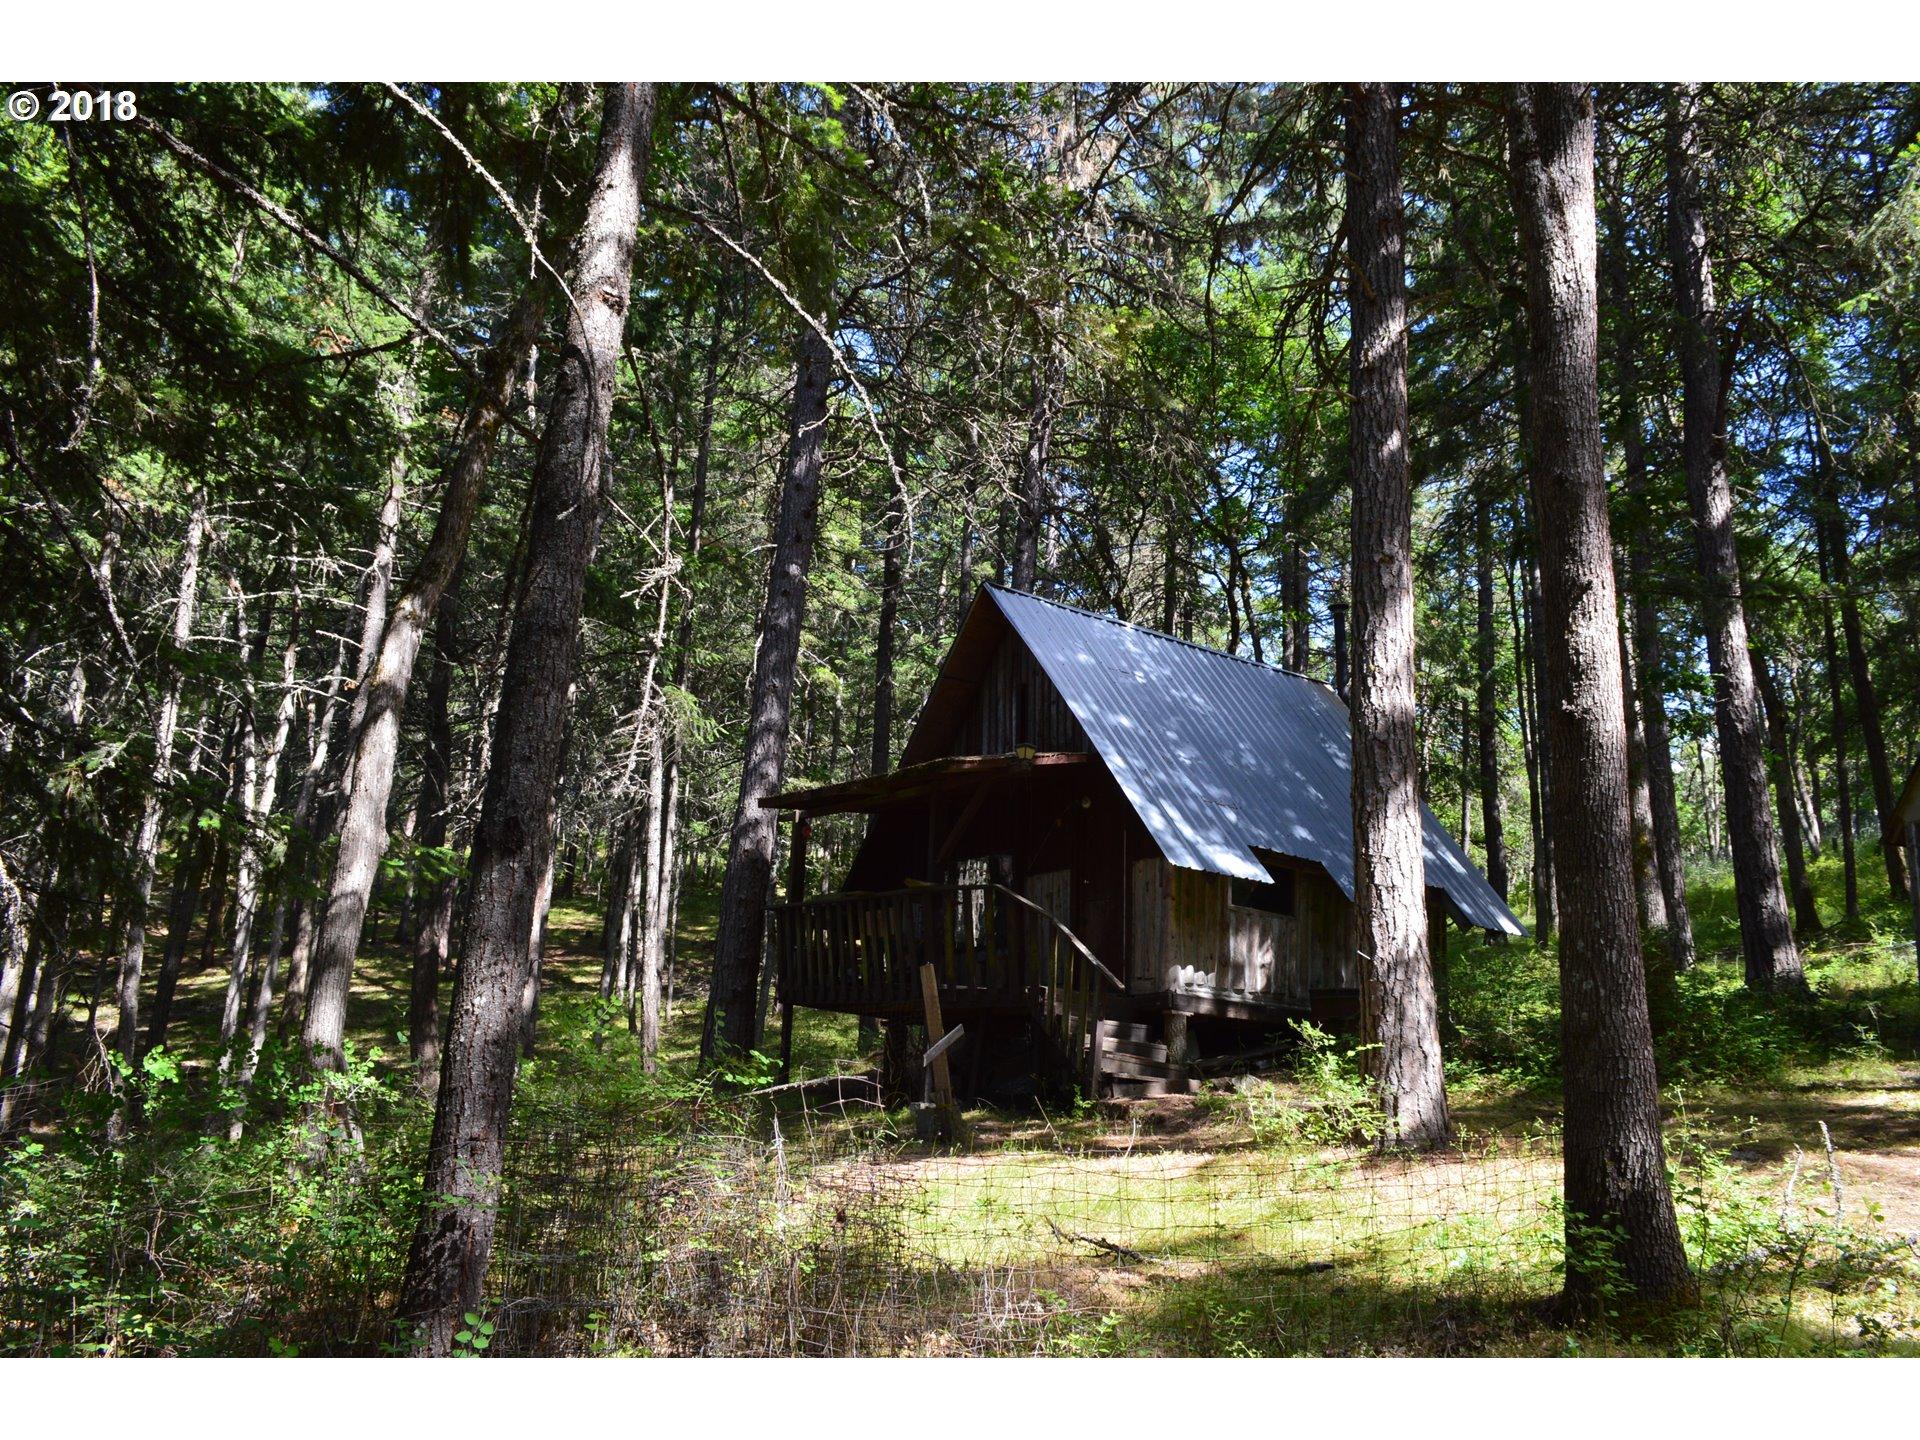 Surprising 2341 Mountain View Way Mosier Or 97040 Geraldine Geri Home Interior And Landscaping Oversignezvosmurscom